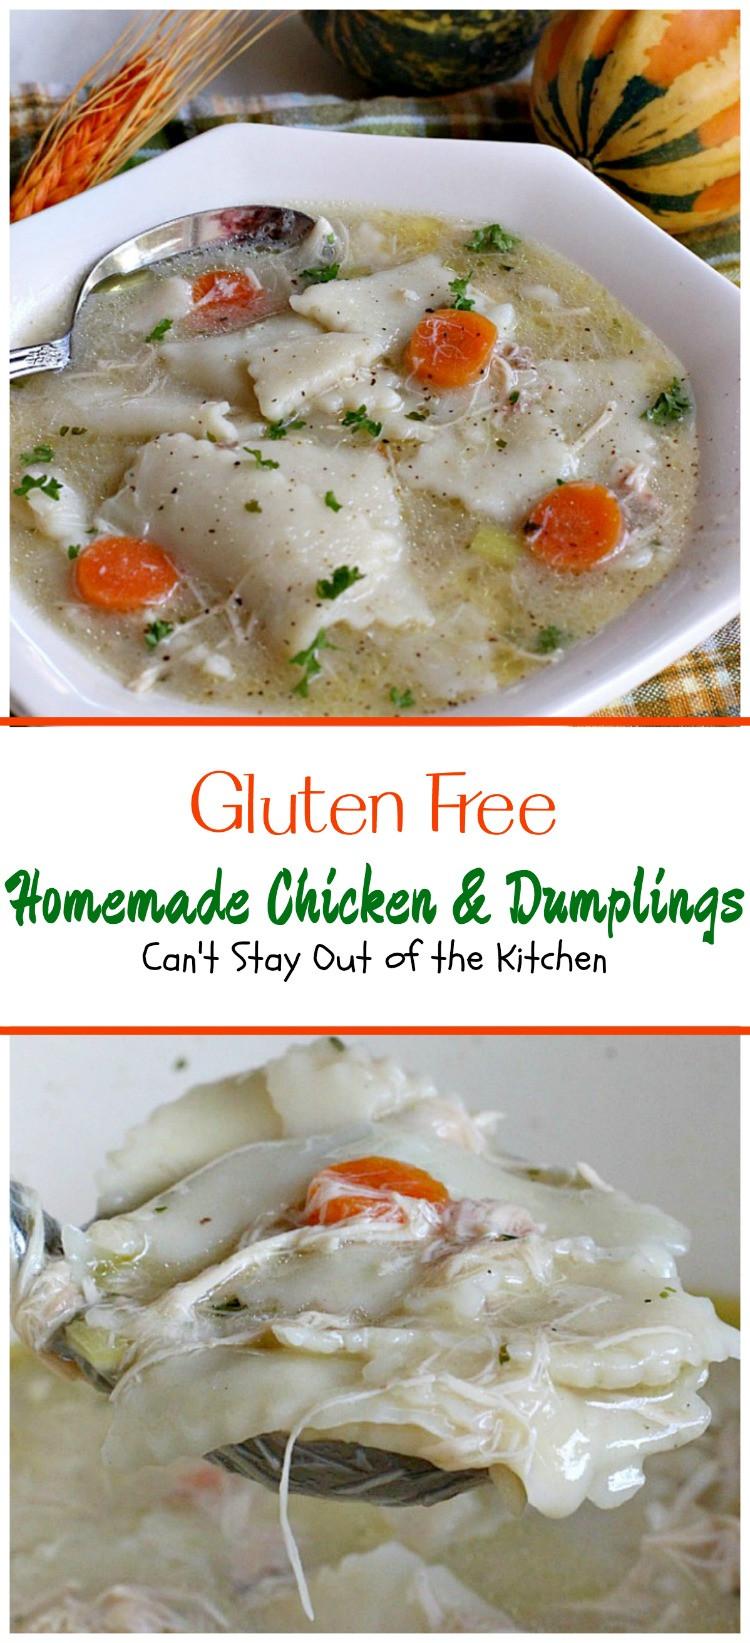 Gluten Free Chicken And Dumplings  Gluten Free Homemade Chicken and Dumplings Can t Stay